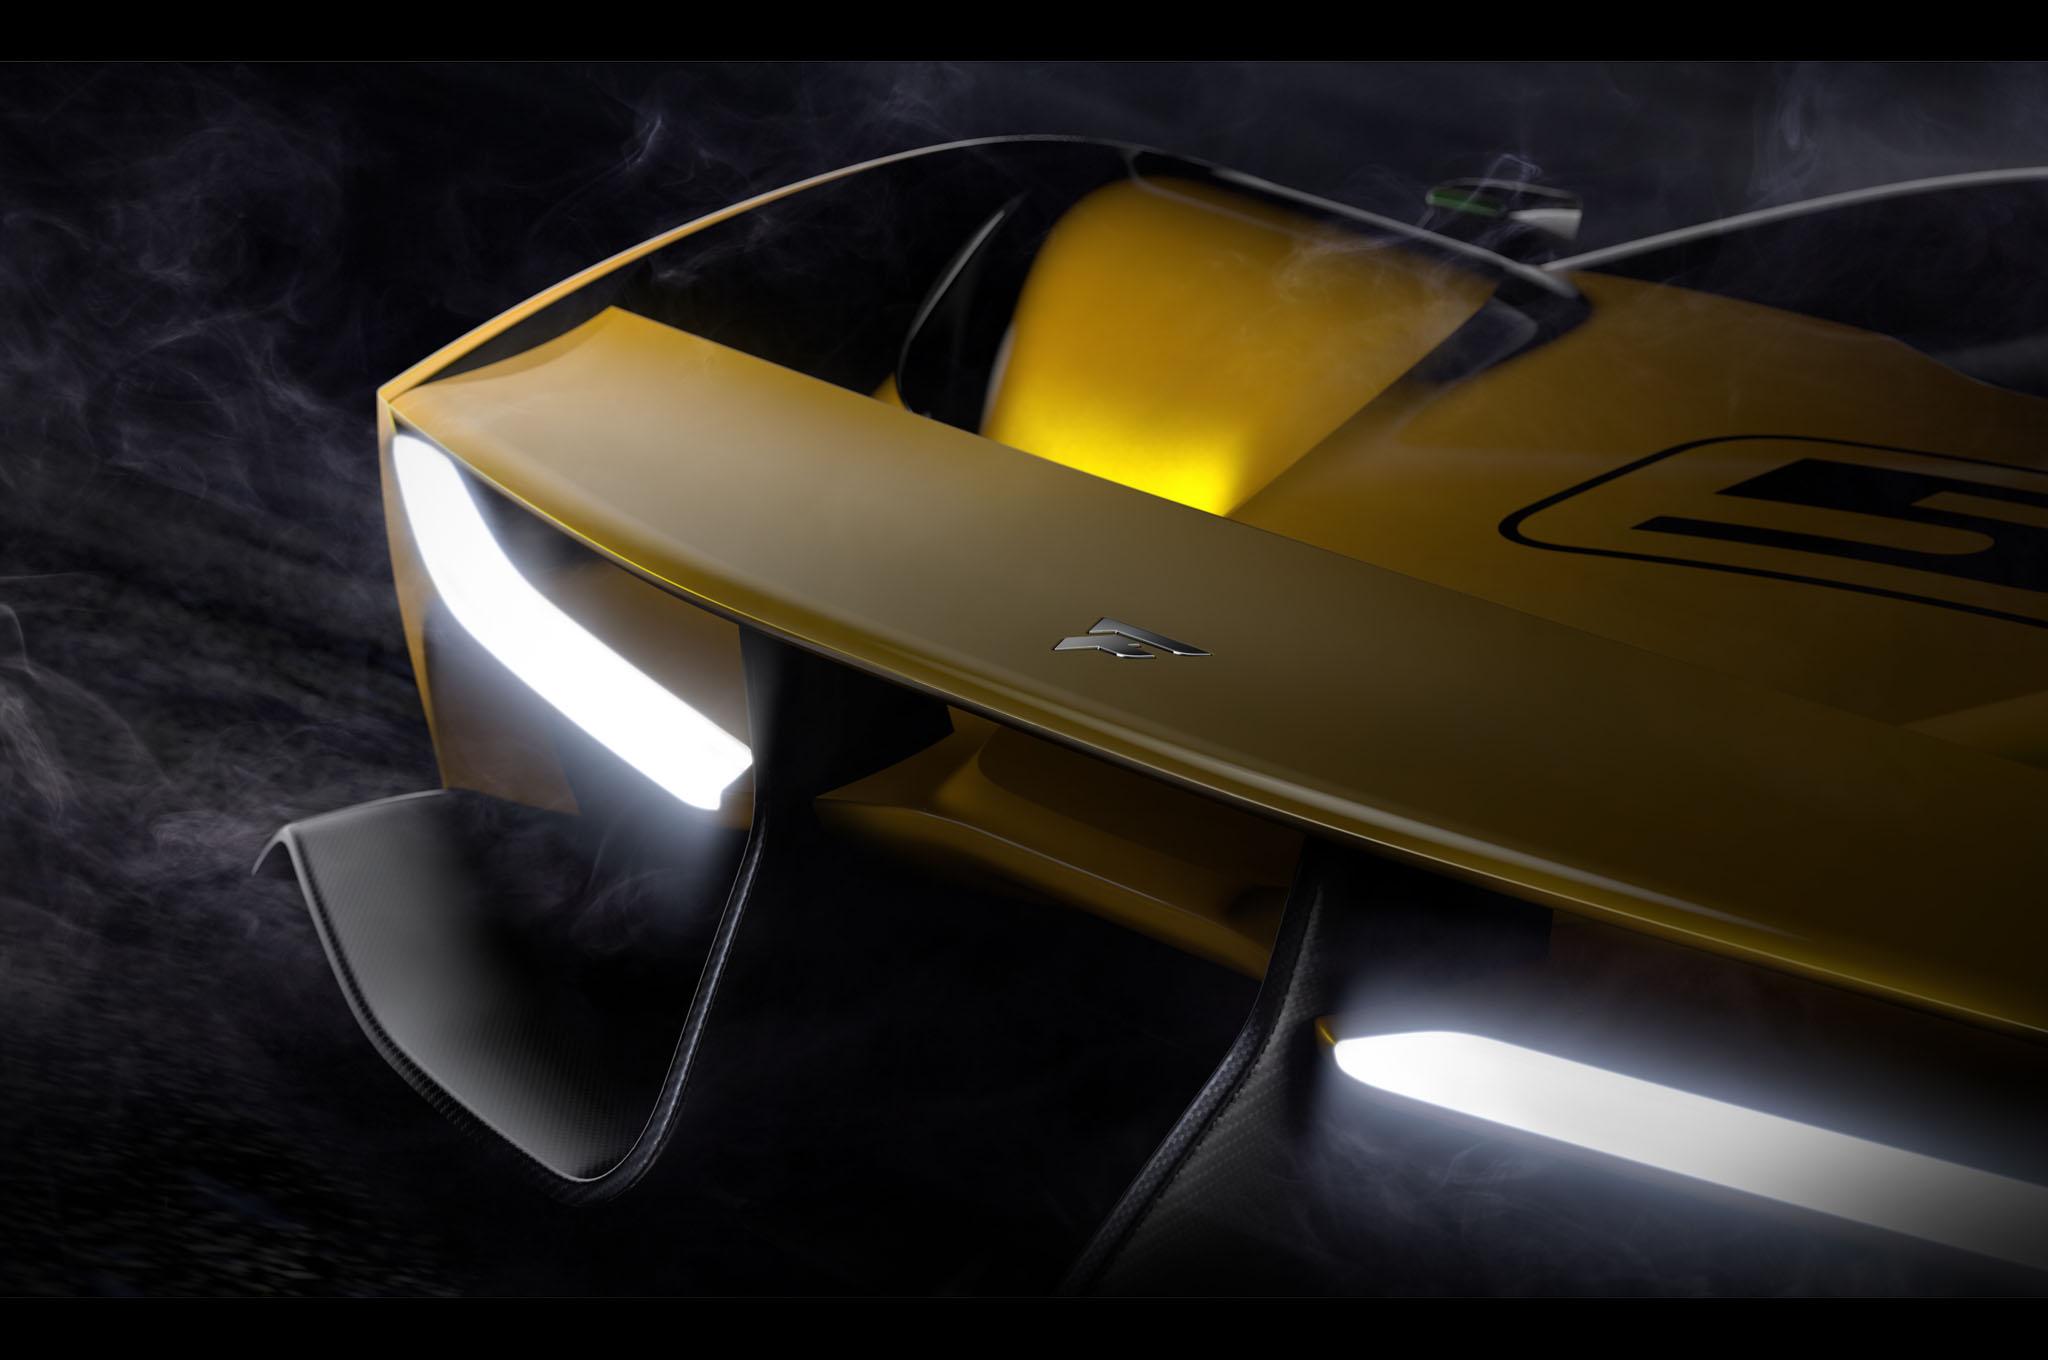 Fittipaldi EF7 Vision Gran Turismo By Pininfarina Teaser